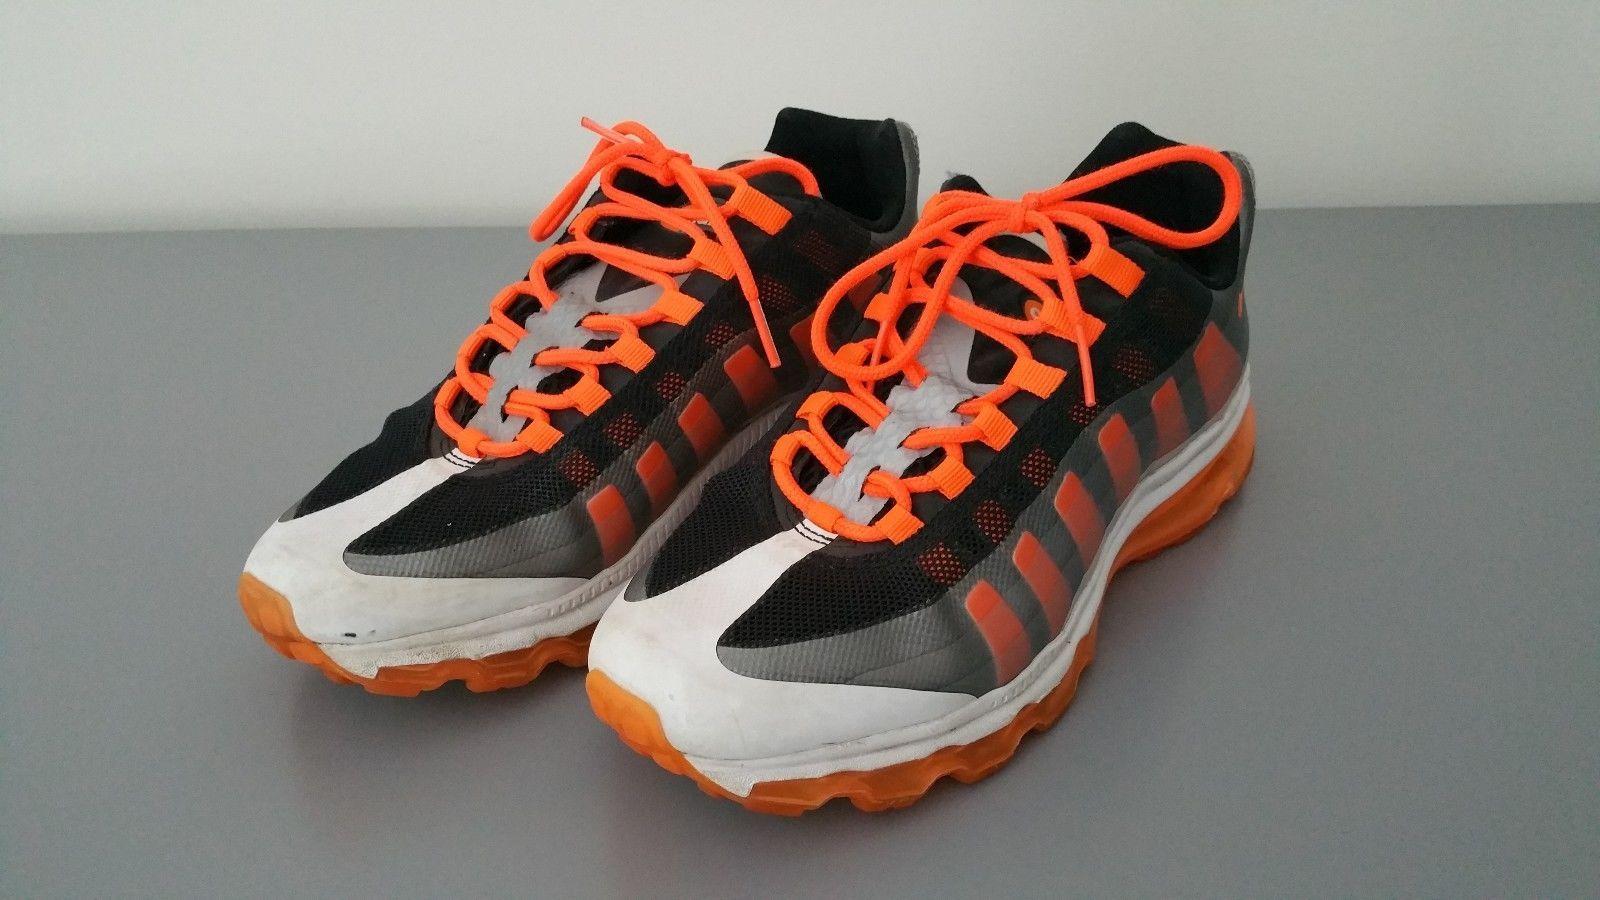 Nike 512169-007 GS Air Max 95 BB Running Shoes Orange Black White Size 7Y